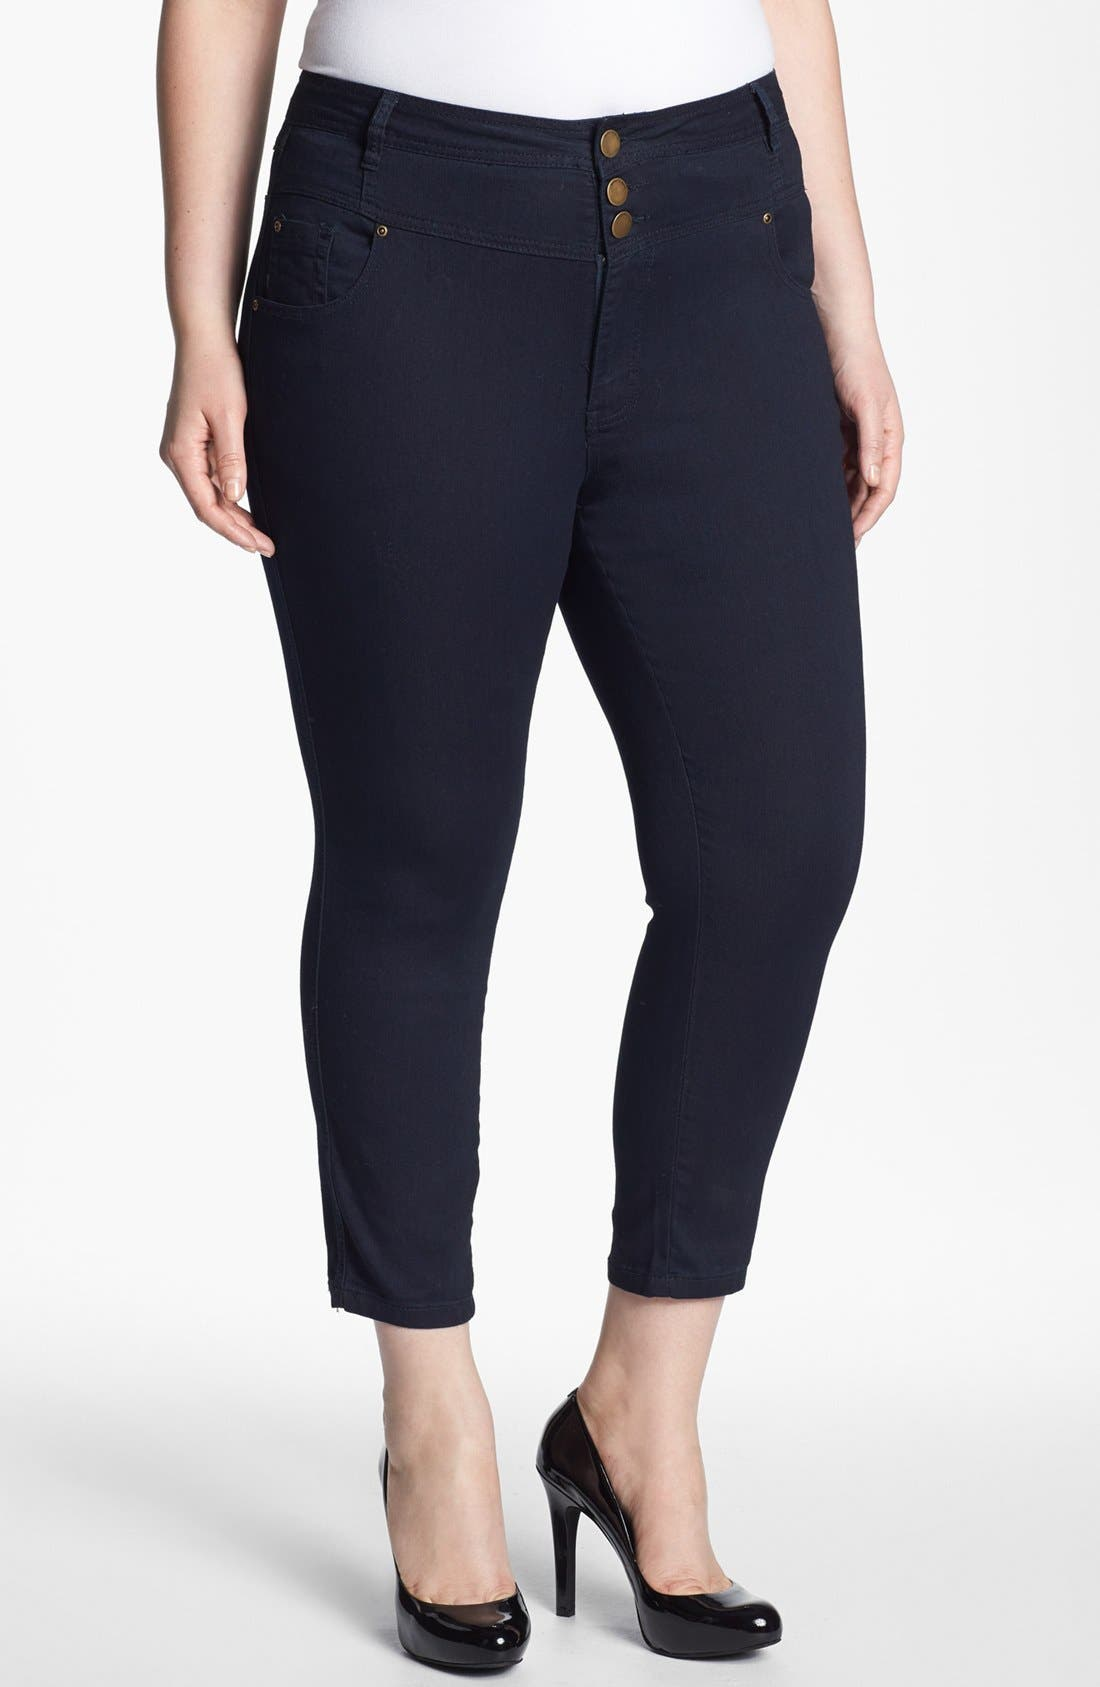 Alternate Image 1 Selected - Evans High Waist Slim Ankle Jeans (Plus Size)